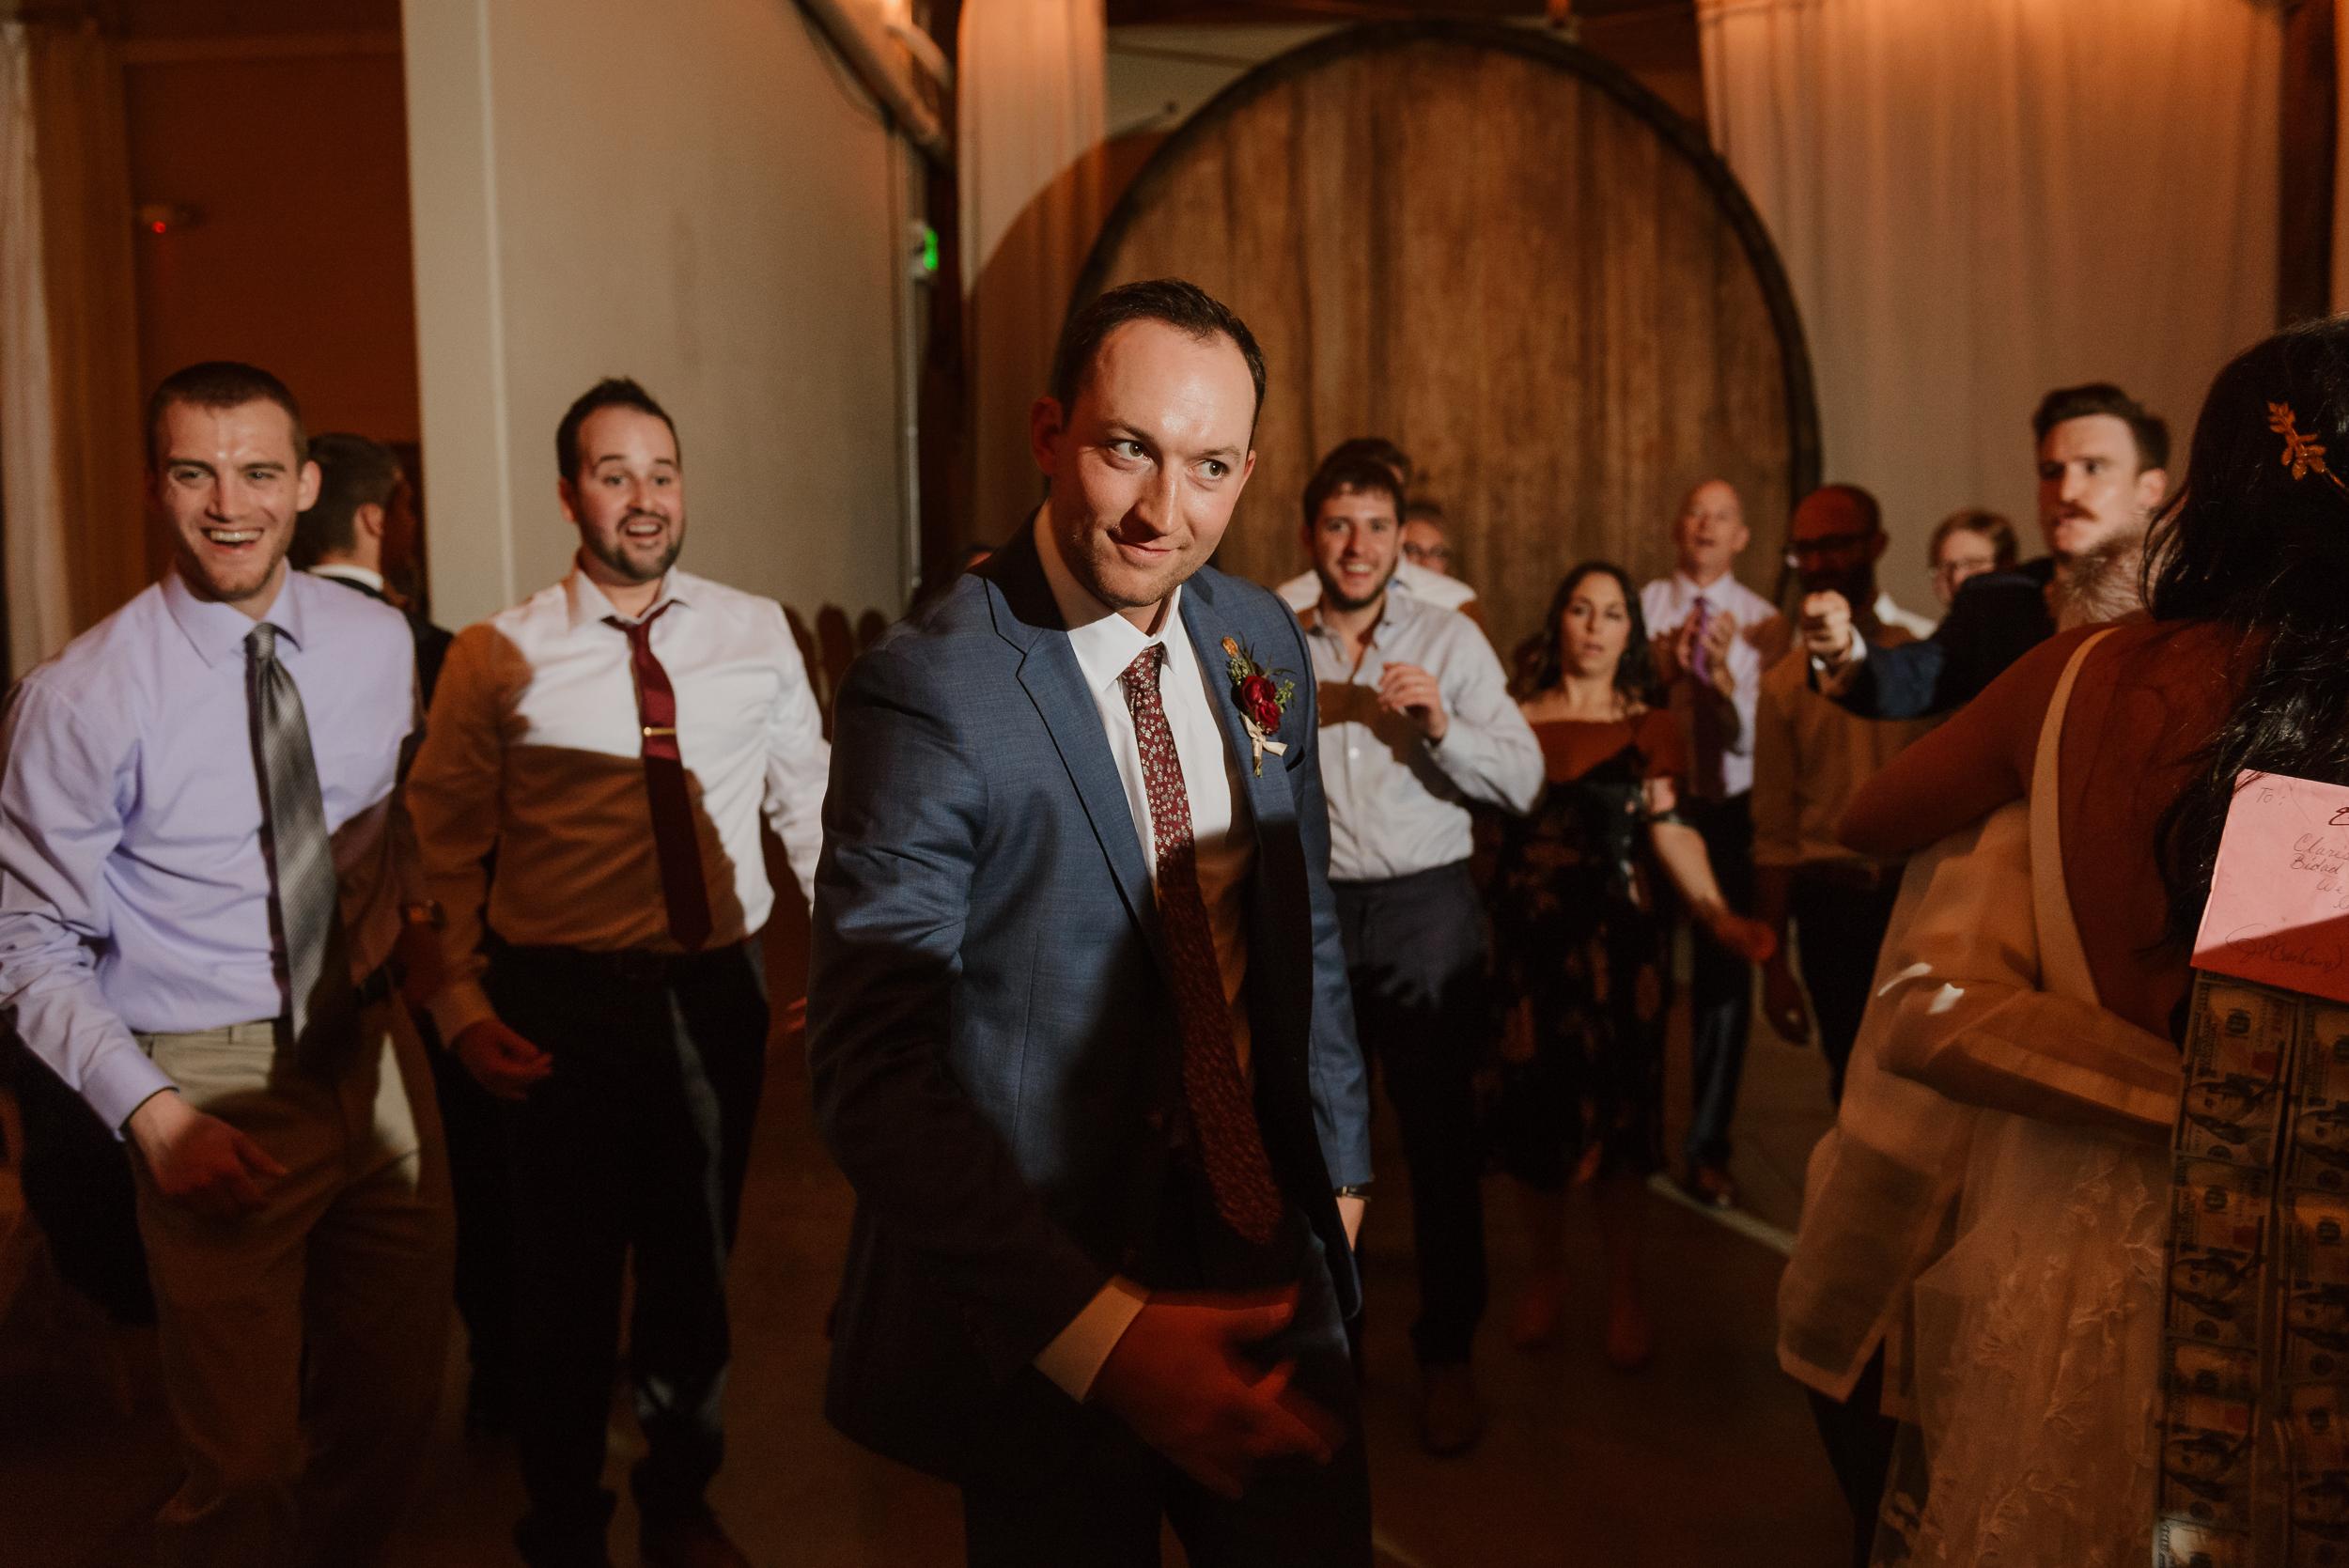 098-healdsburg-soda-rock-winery-wedding-vivianchen-770.jpg